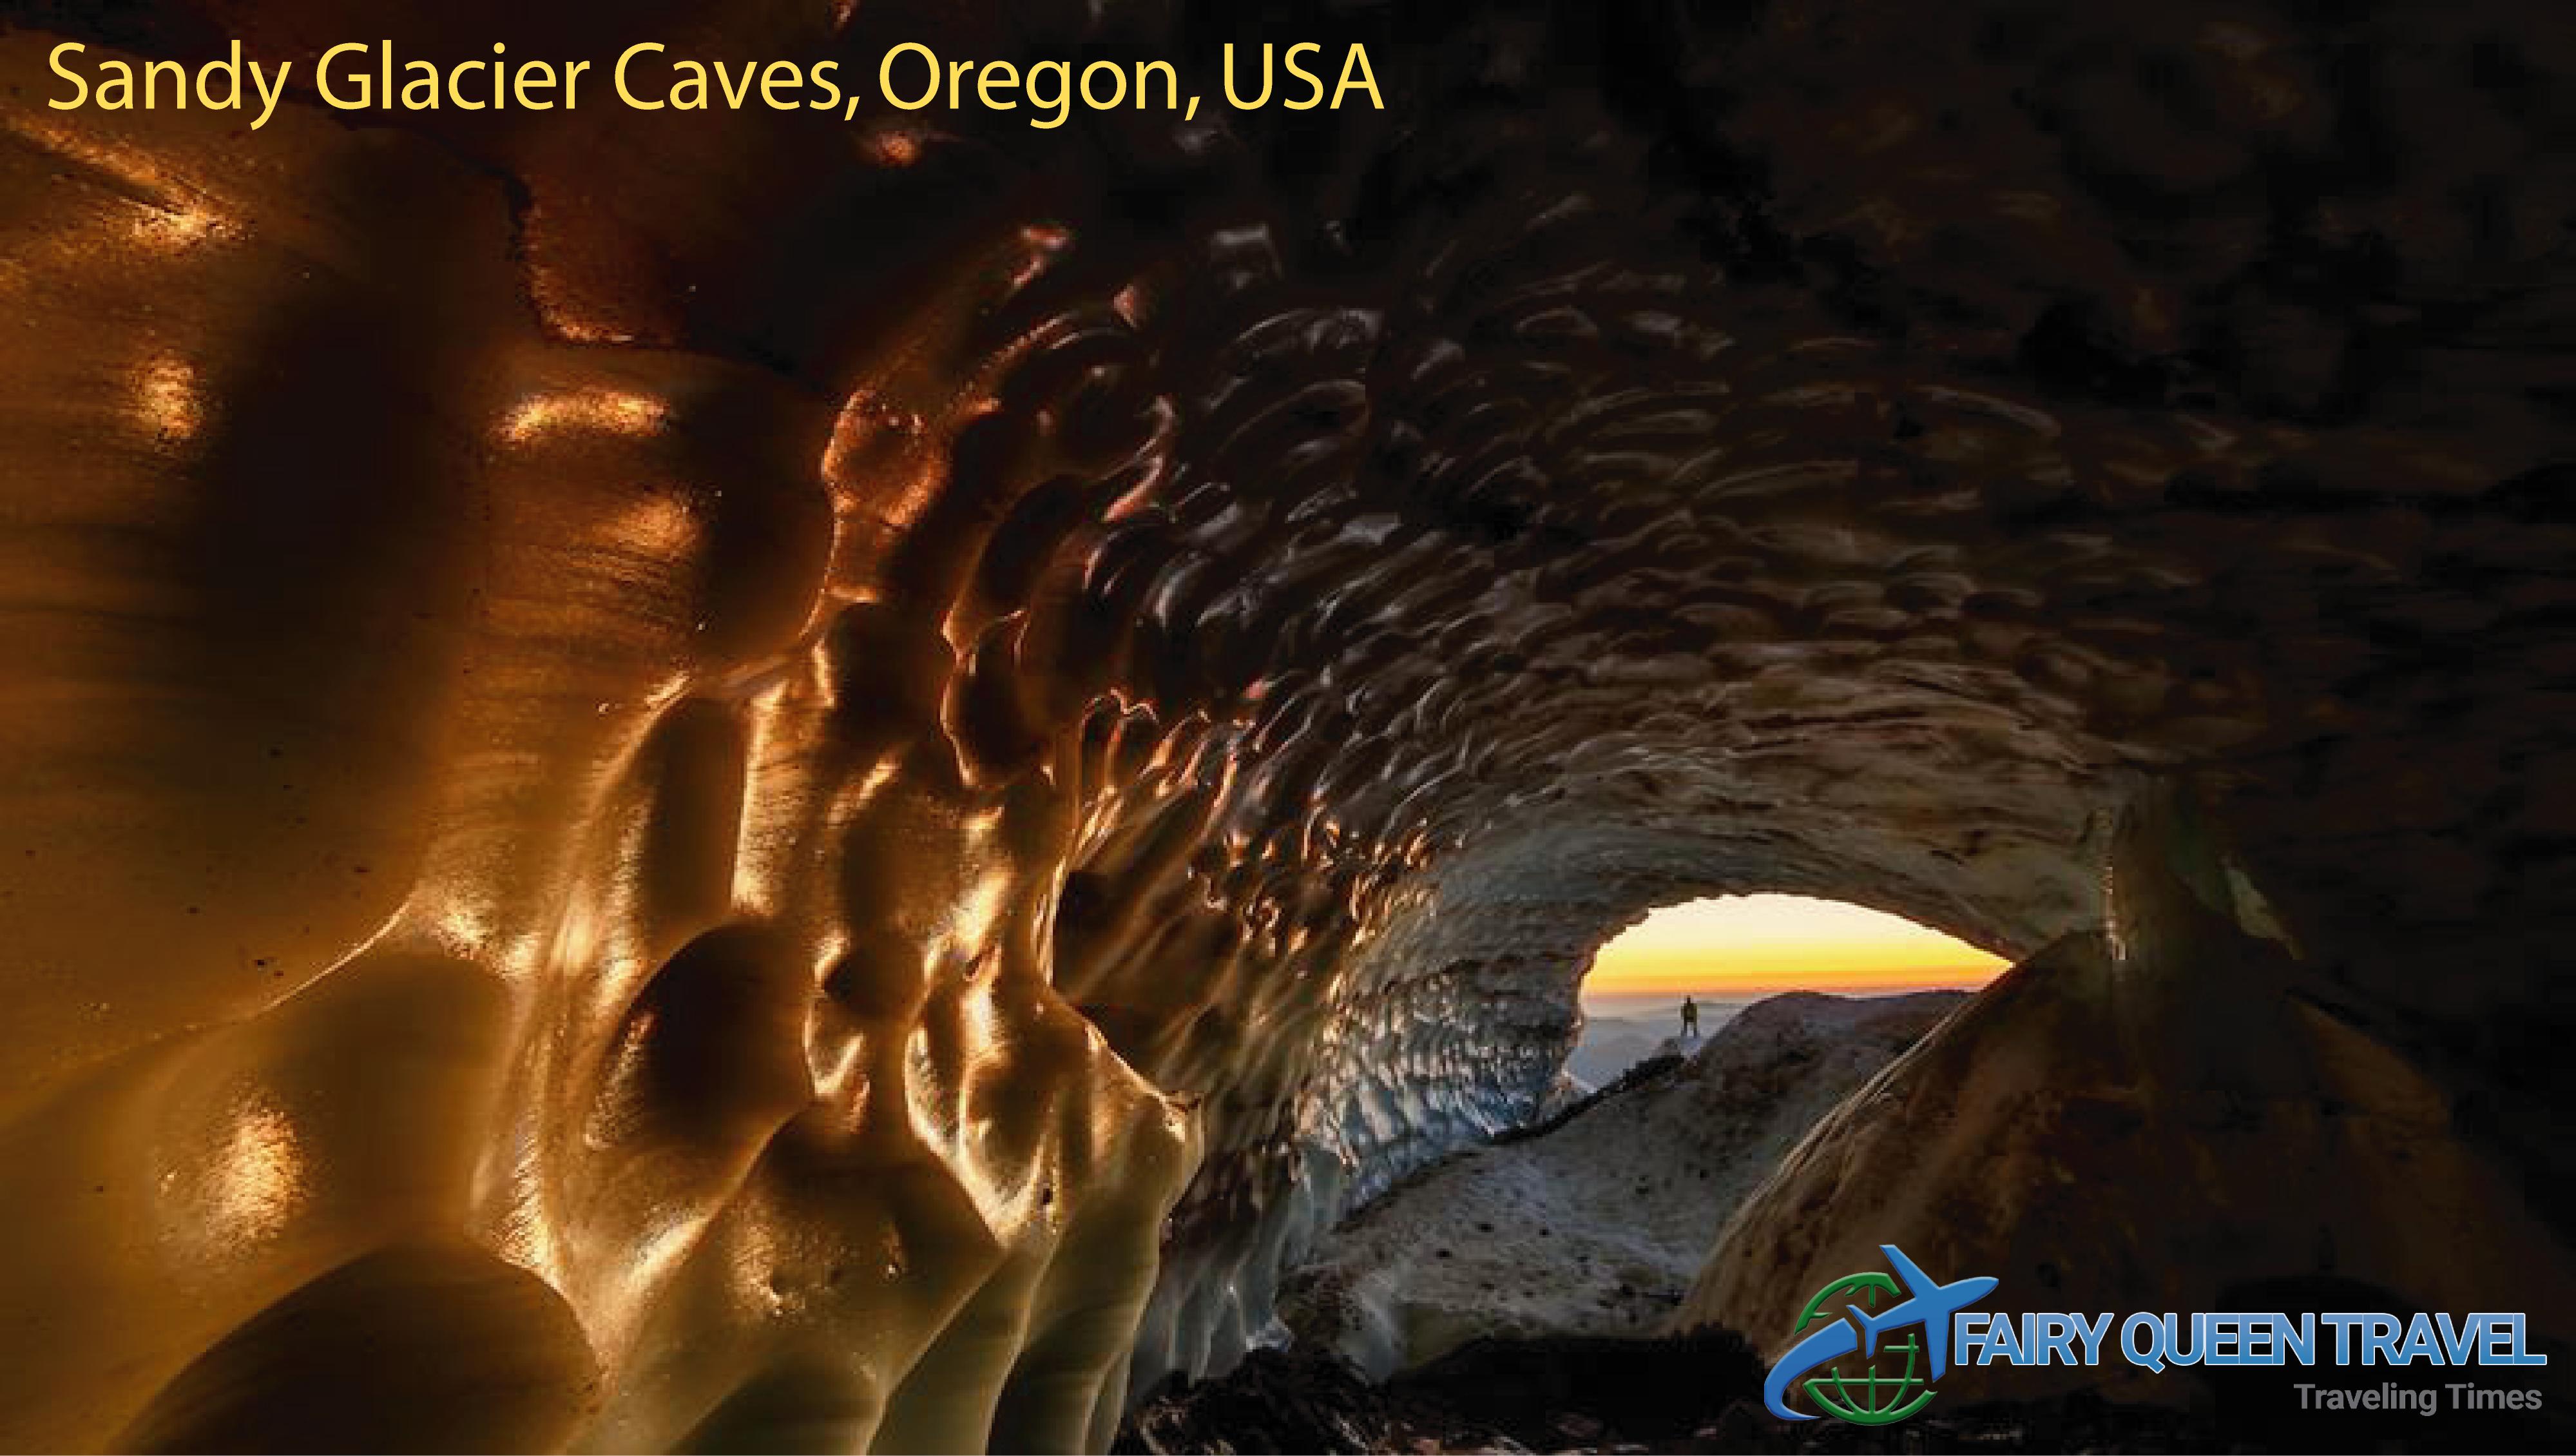 Sandy Glacier Caves, Oregon, USA Sandy Glacier is one of